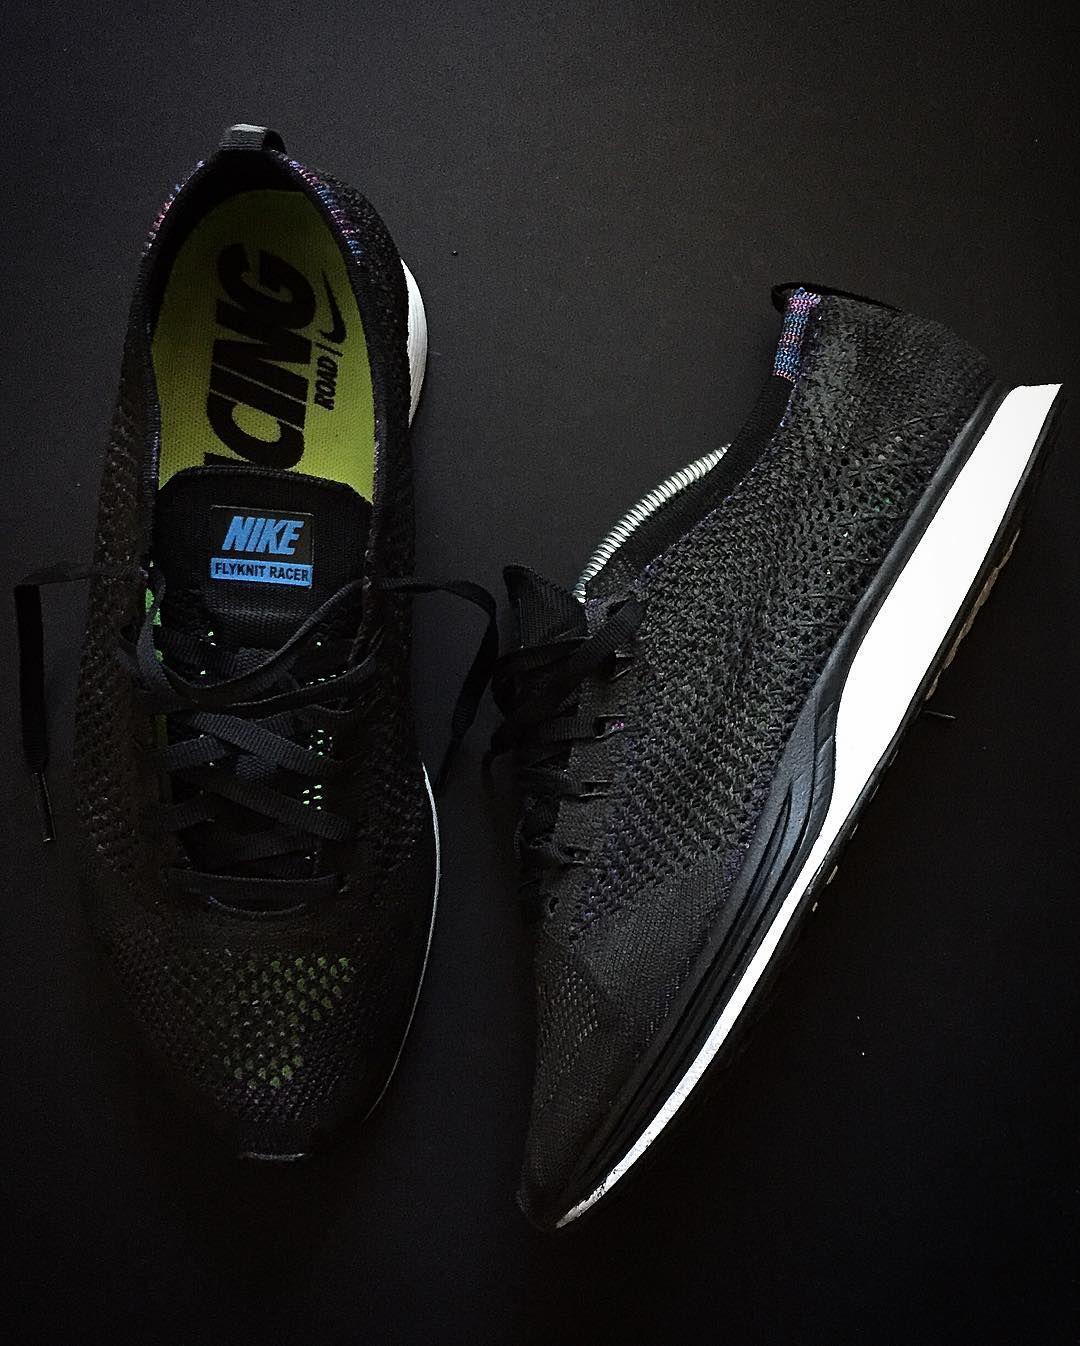 Black out My Racers! Have to finish. LIKE The Back stiching coloured... #nike #nikeflyknit #flyknitseed #flyknitheat #flyknitworld #fliknitracer #flyknitseller #sneakers #sneakerhead #sneakerheaduk #snkrhds #crepecity #customkicks #sneakergang #sneakerpalette #nicekicks #hypebeast #snobshots #kicks4eva #theperfectpair #kickstagram #solecollector #solecollector #instapic #instagood #dailykicks #complexkicks #sneakernews #vsco #vscocam #vscodaily by laertepappalardo